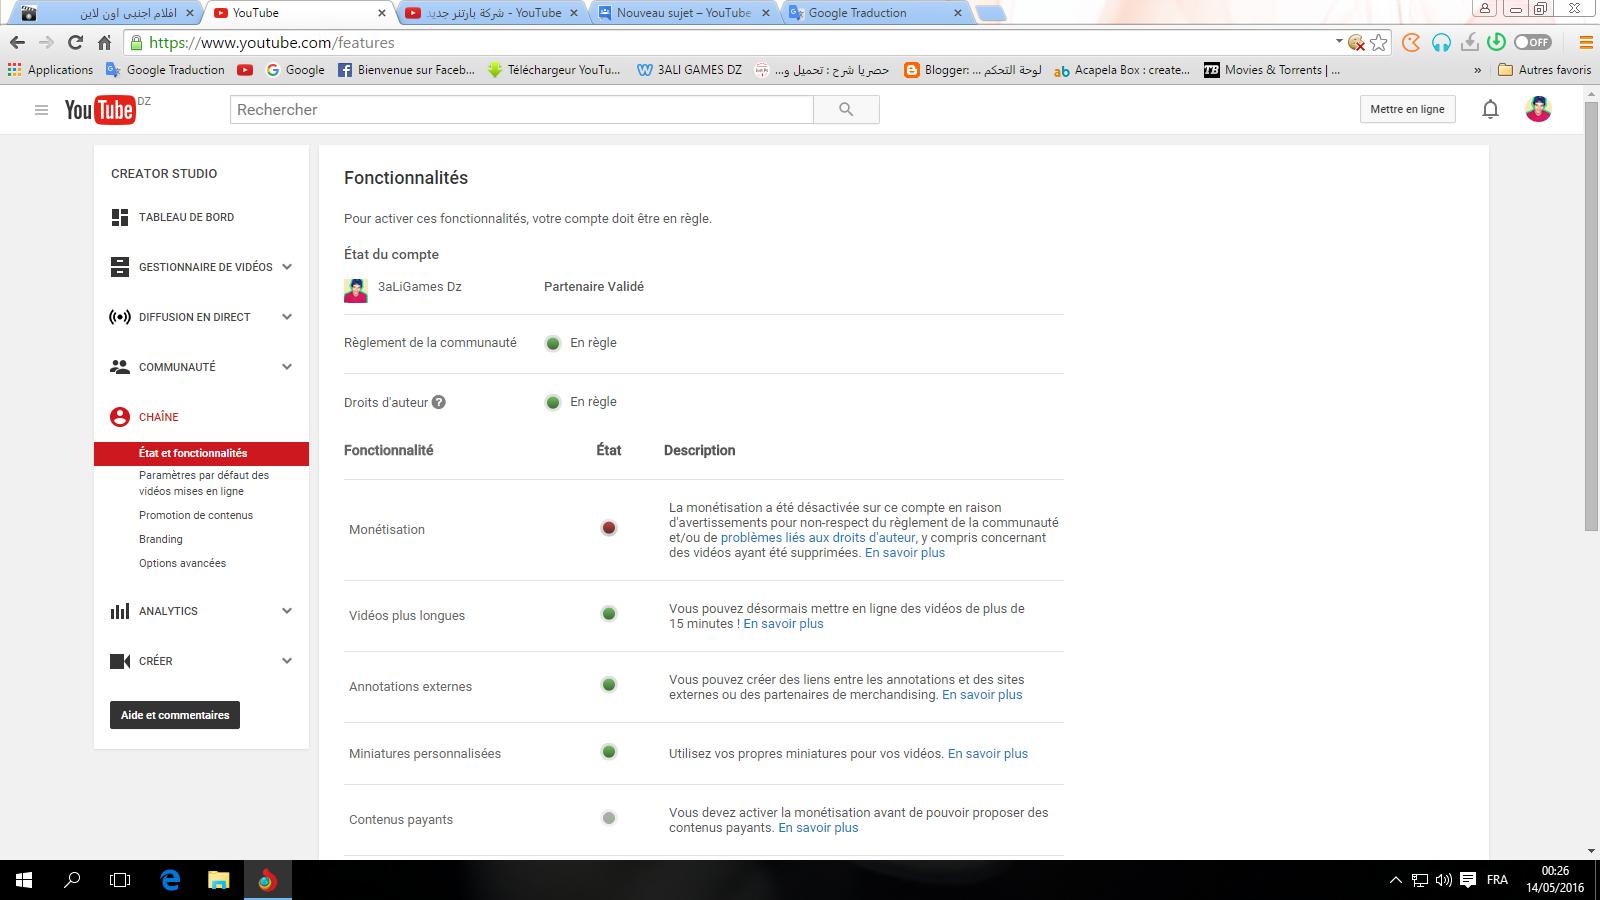 La monétisation - Aide YouTube